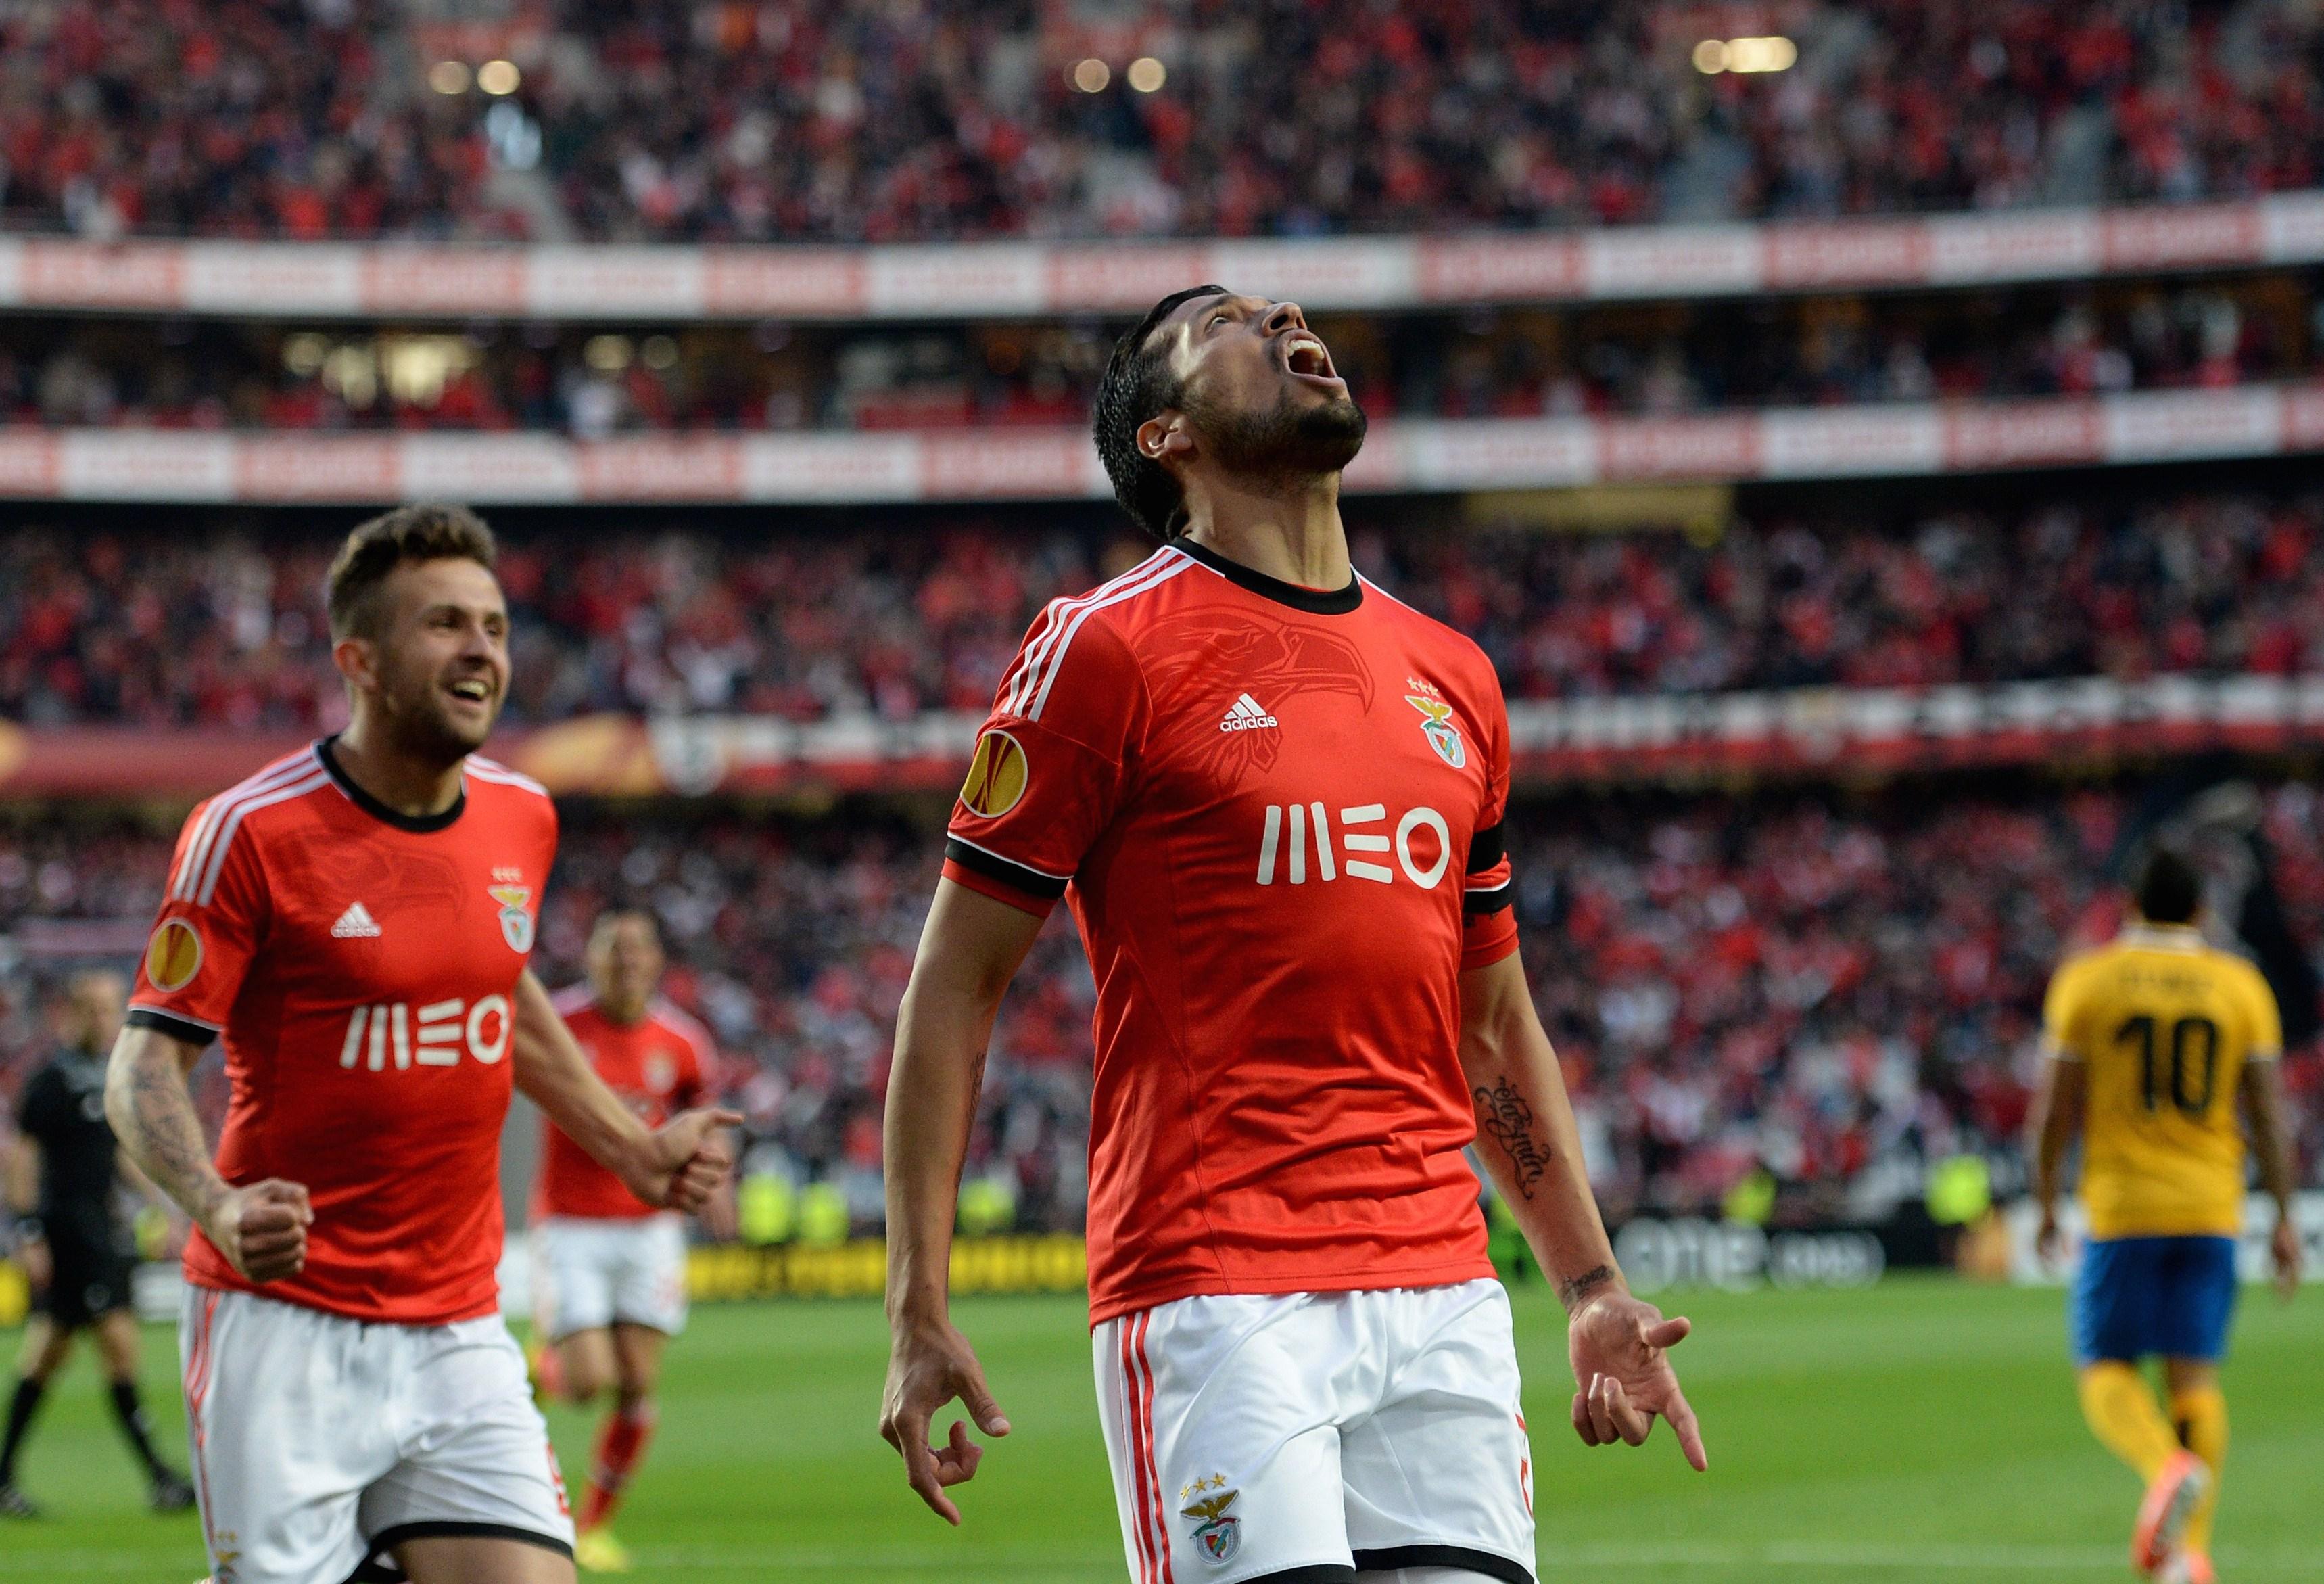 Argentina defender Ezequiel Garay makes switch from Benfica to